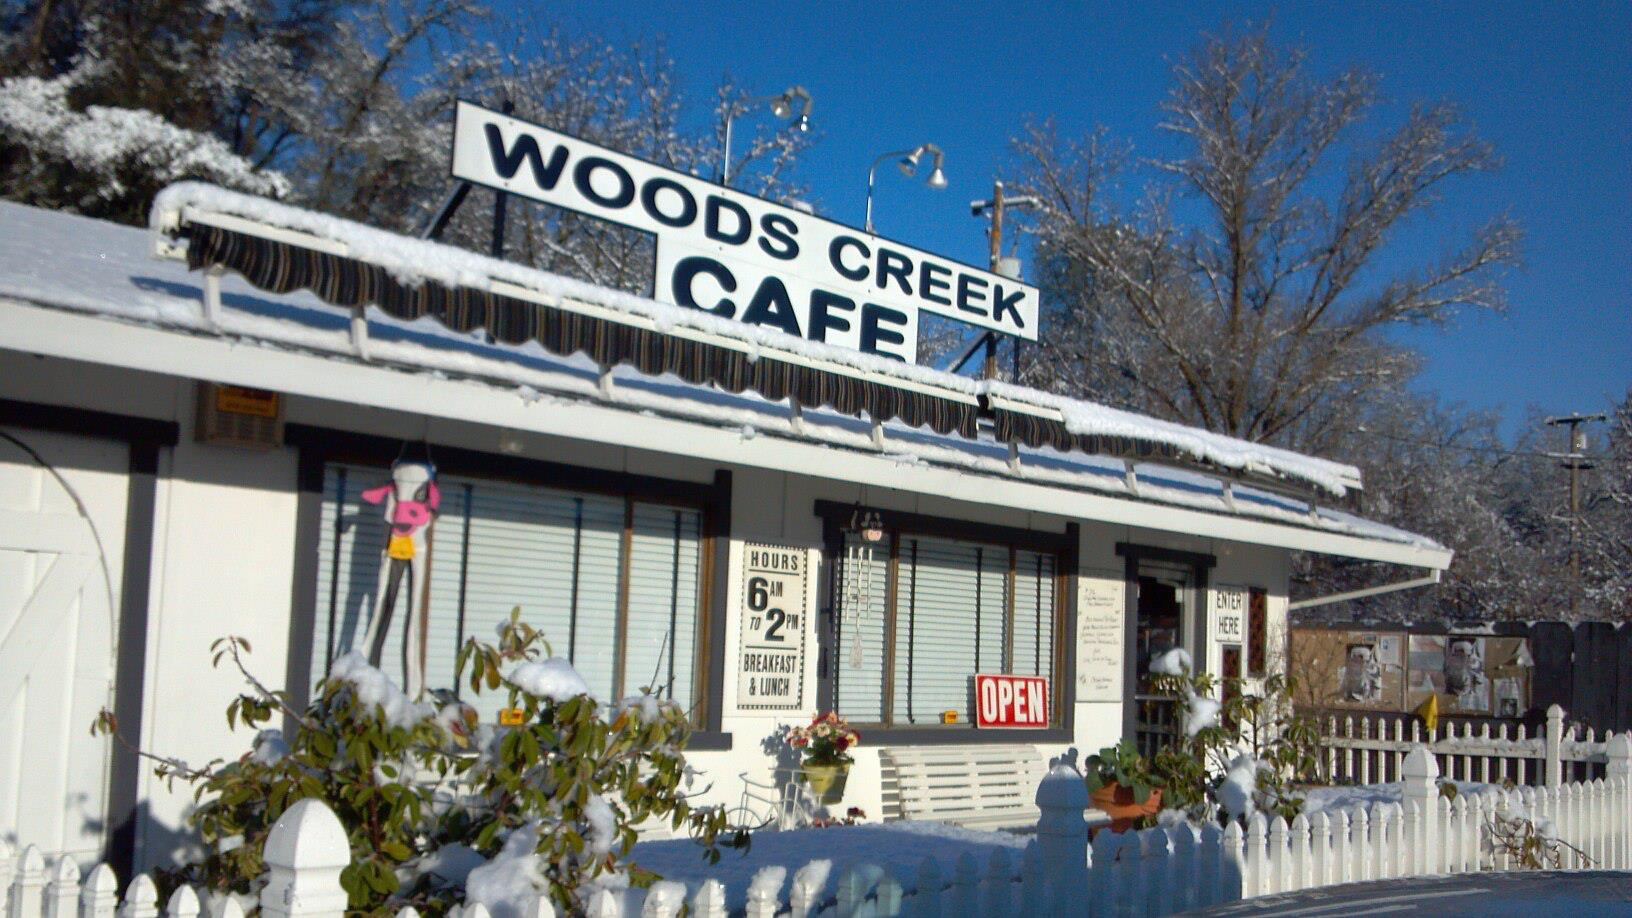 Woods Creek Cafe in Jamestown